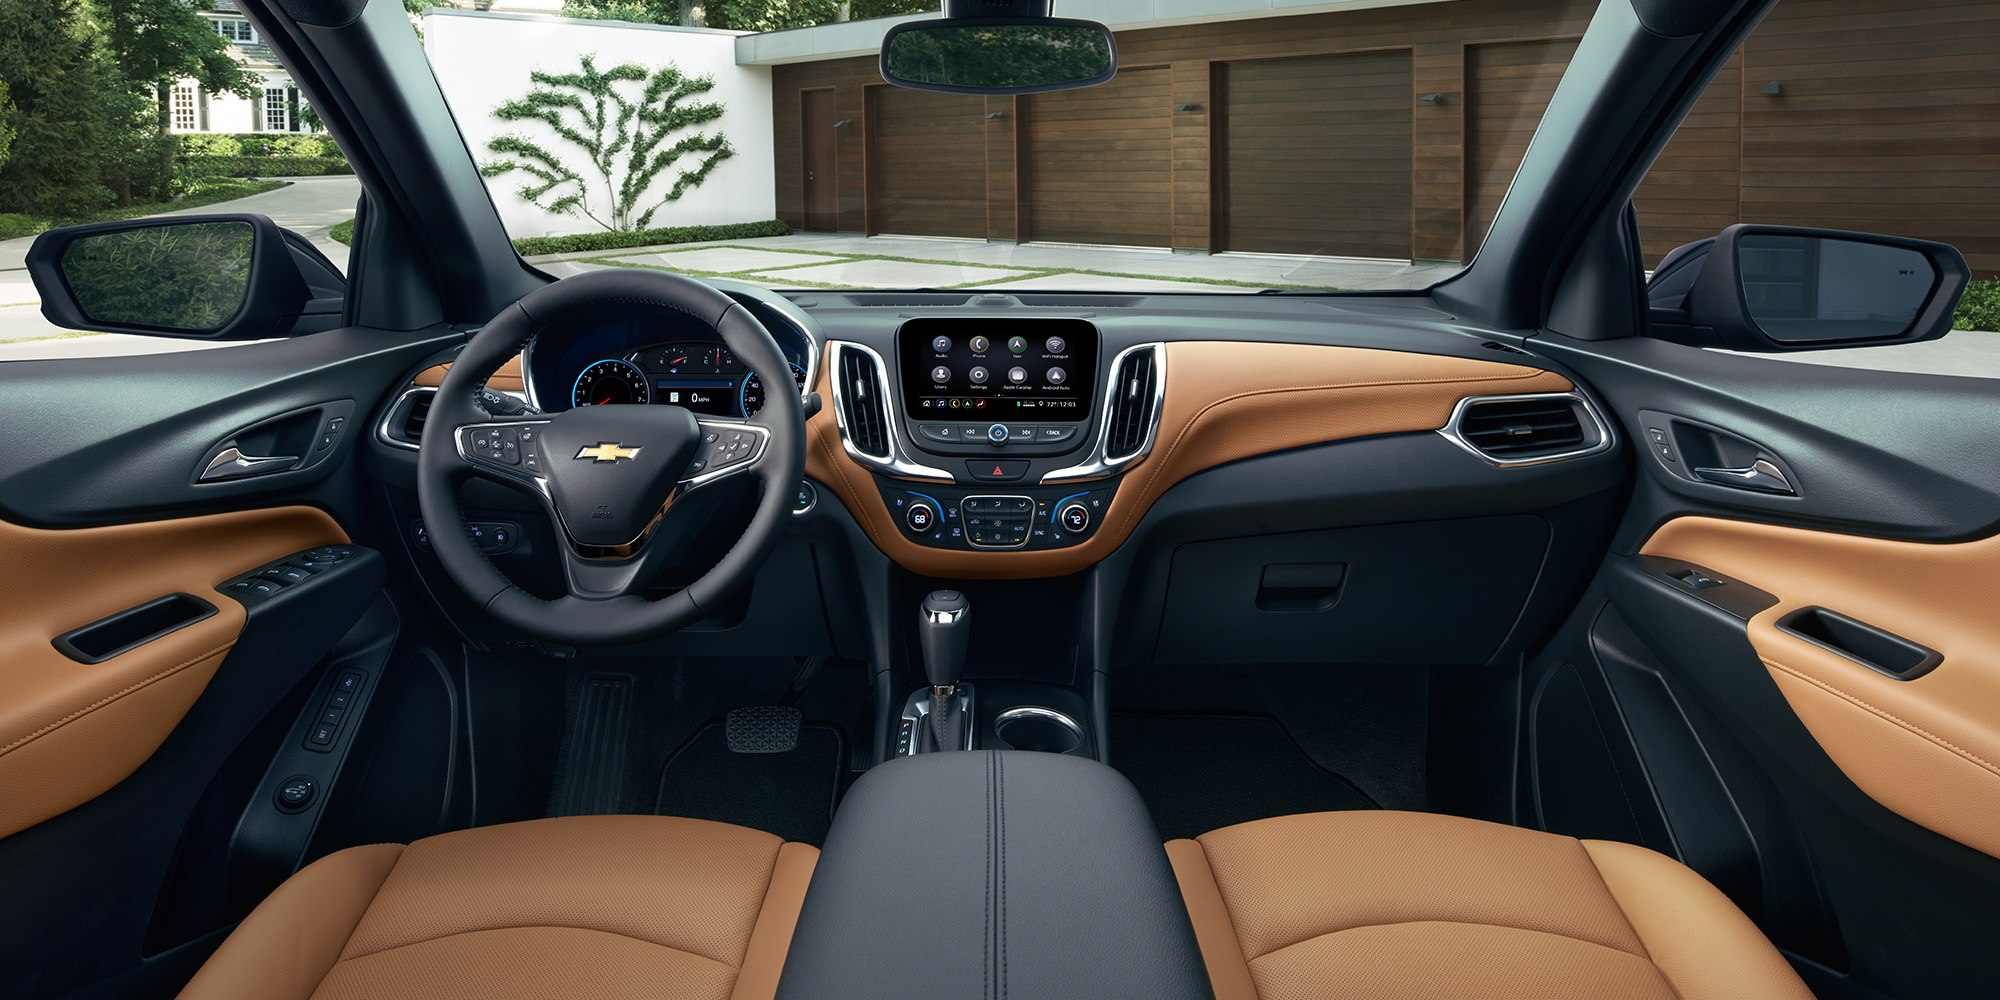 2019 Chevrolet Equinox Financing near Orland Park, IL